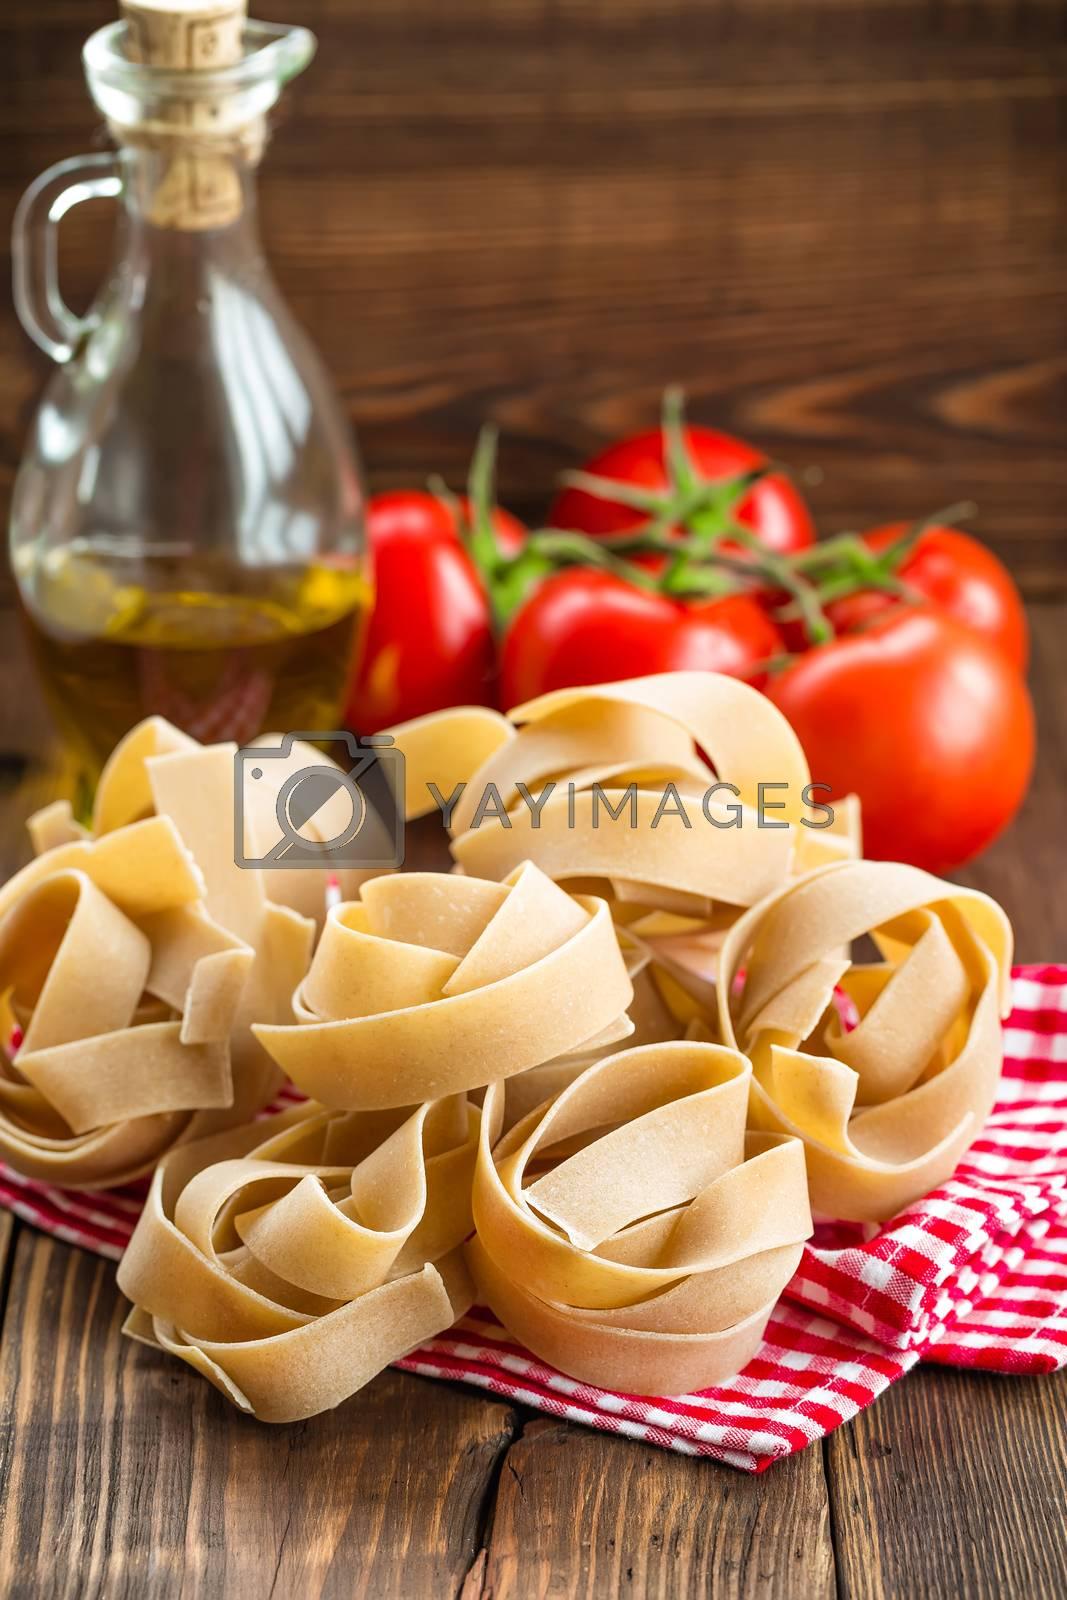 Royalty free image of Pasta by yelenayemchuk